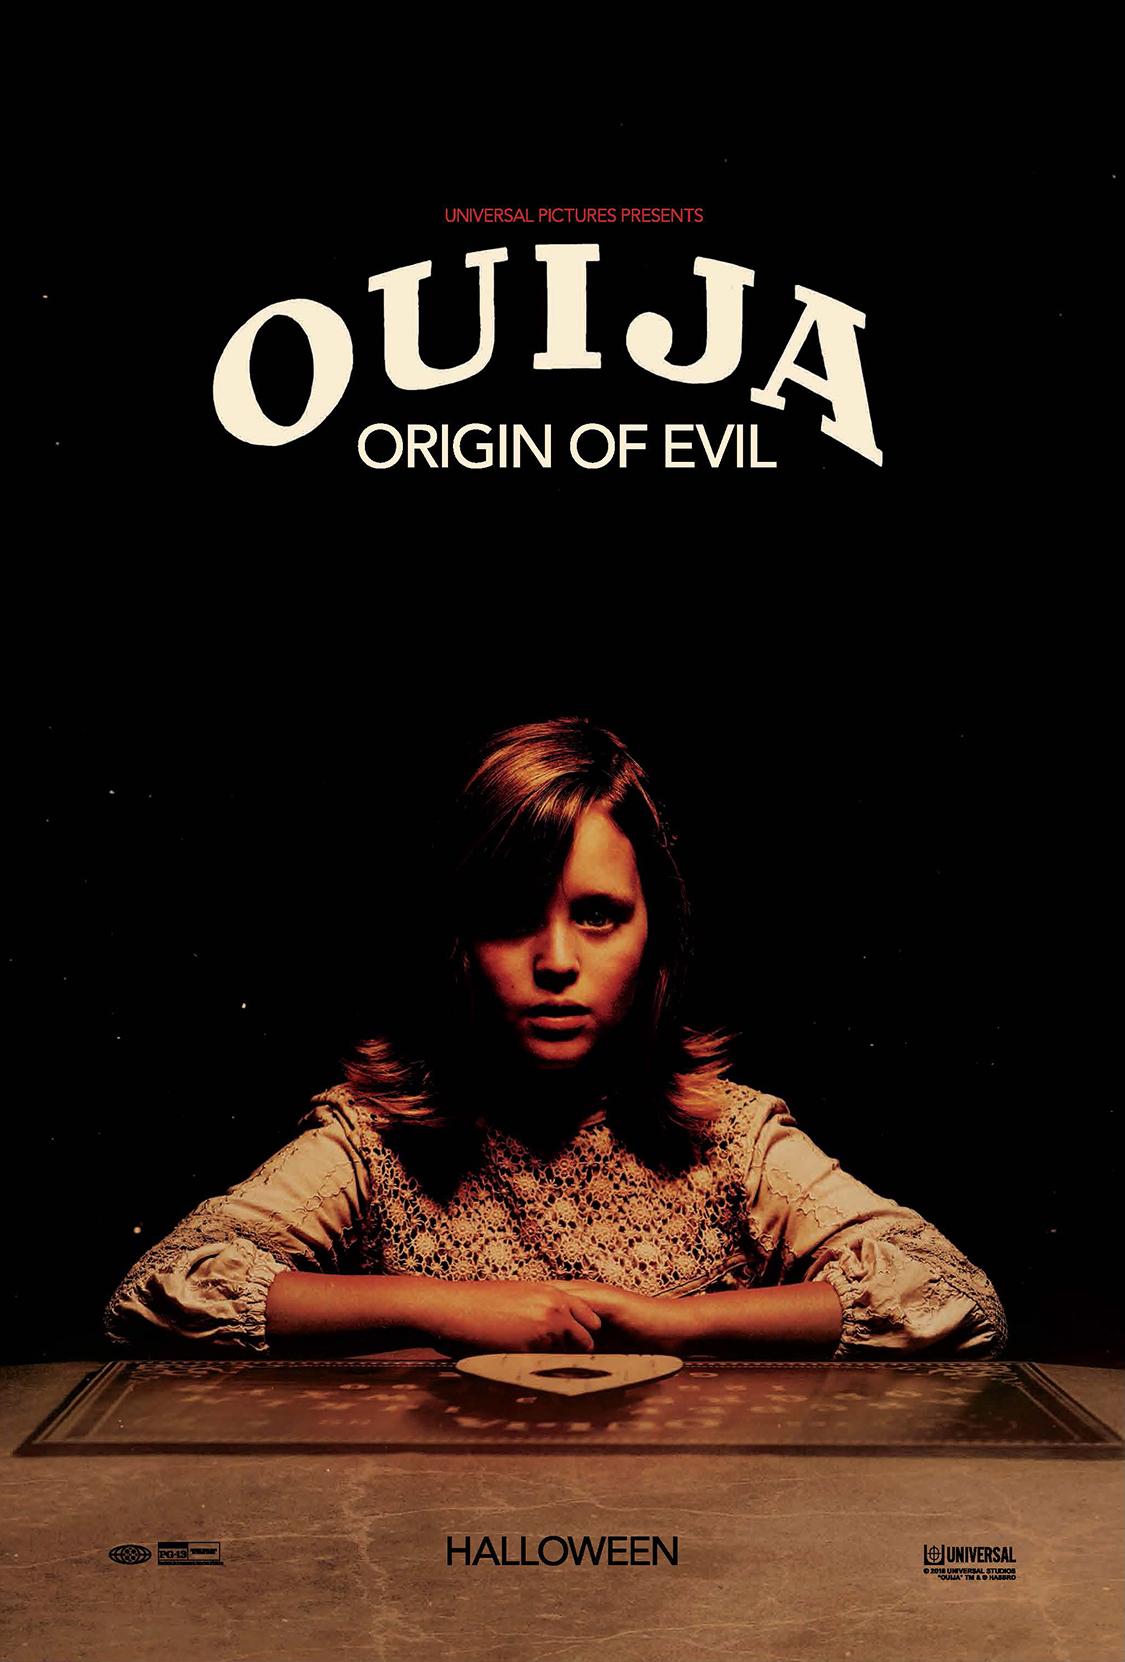 Ouija: Origin Of Evil review: better than the original?